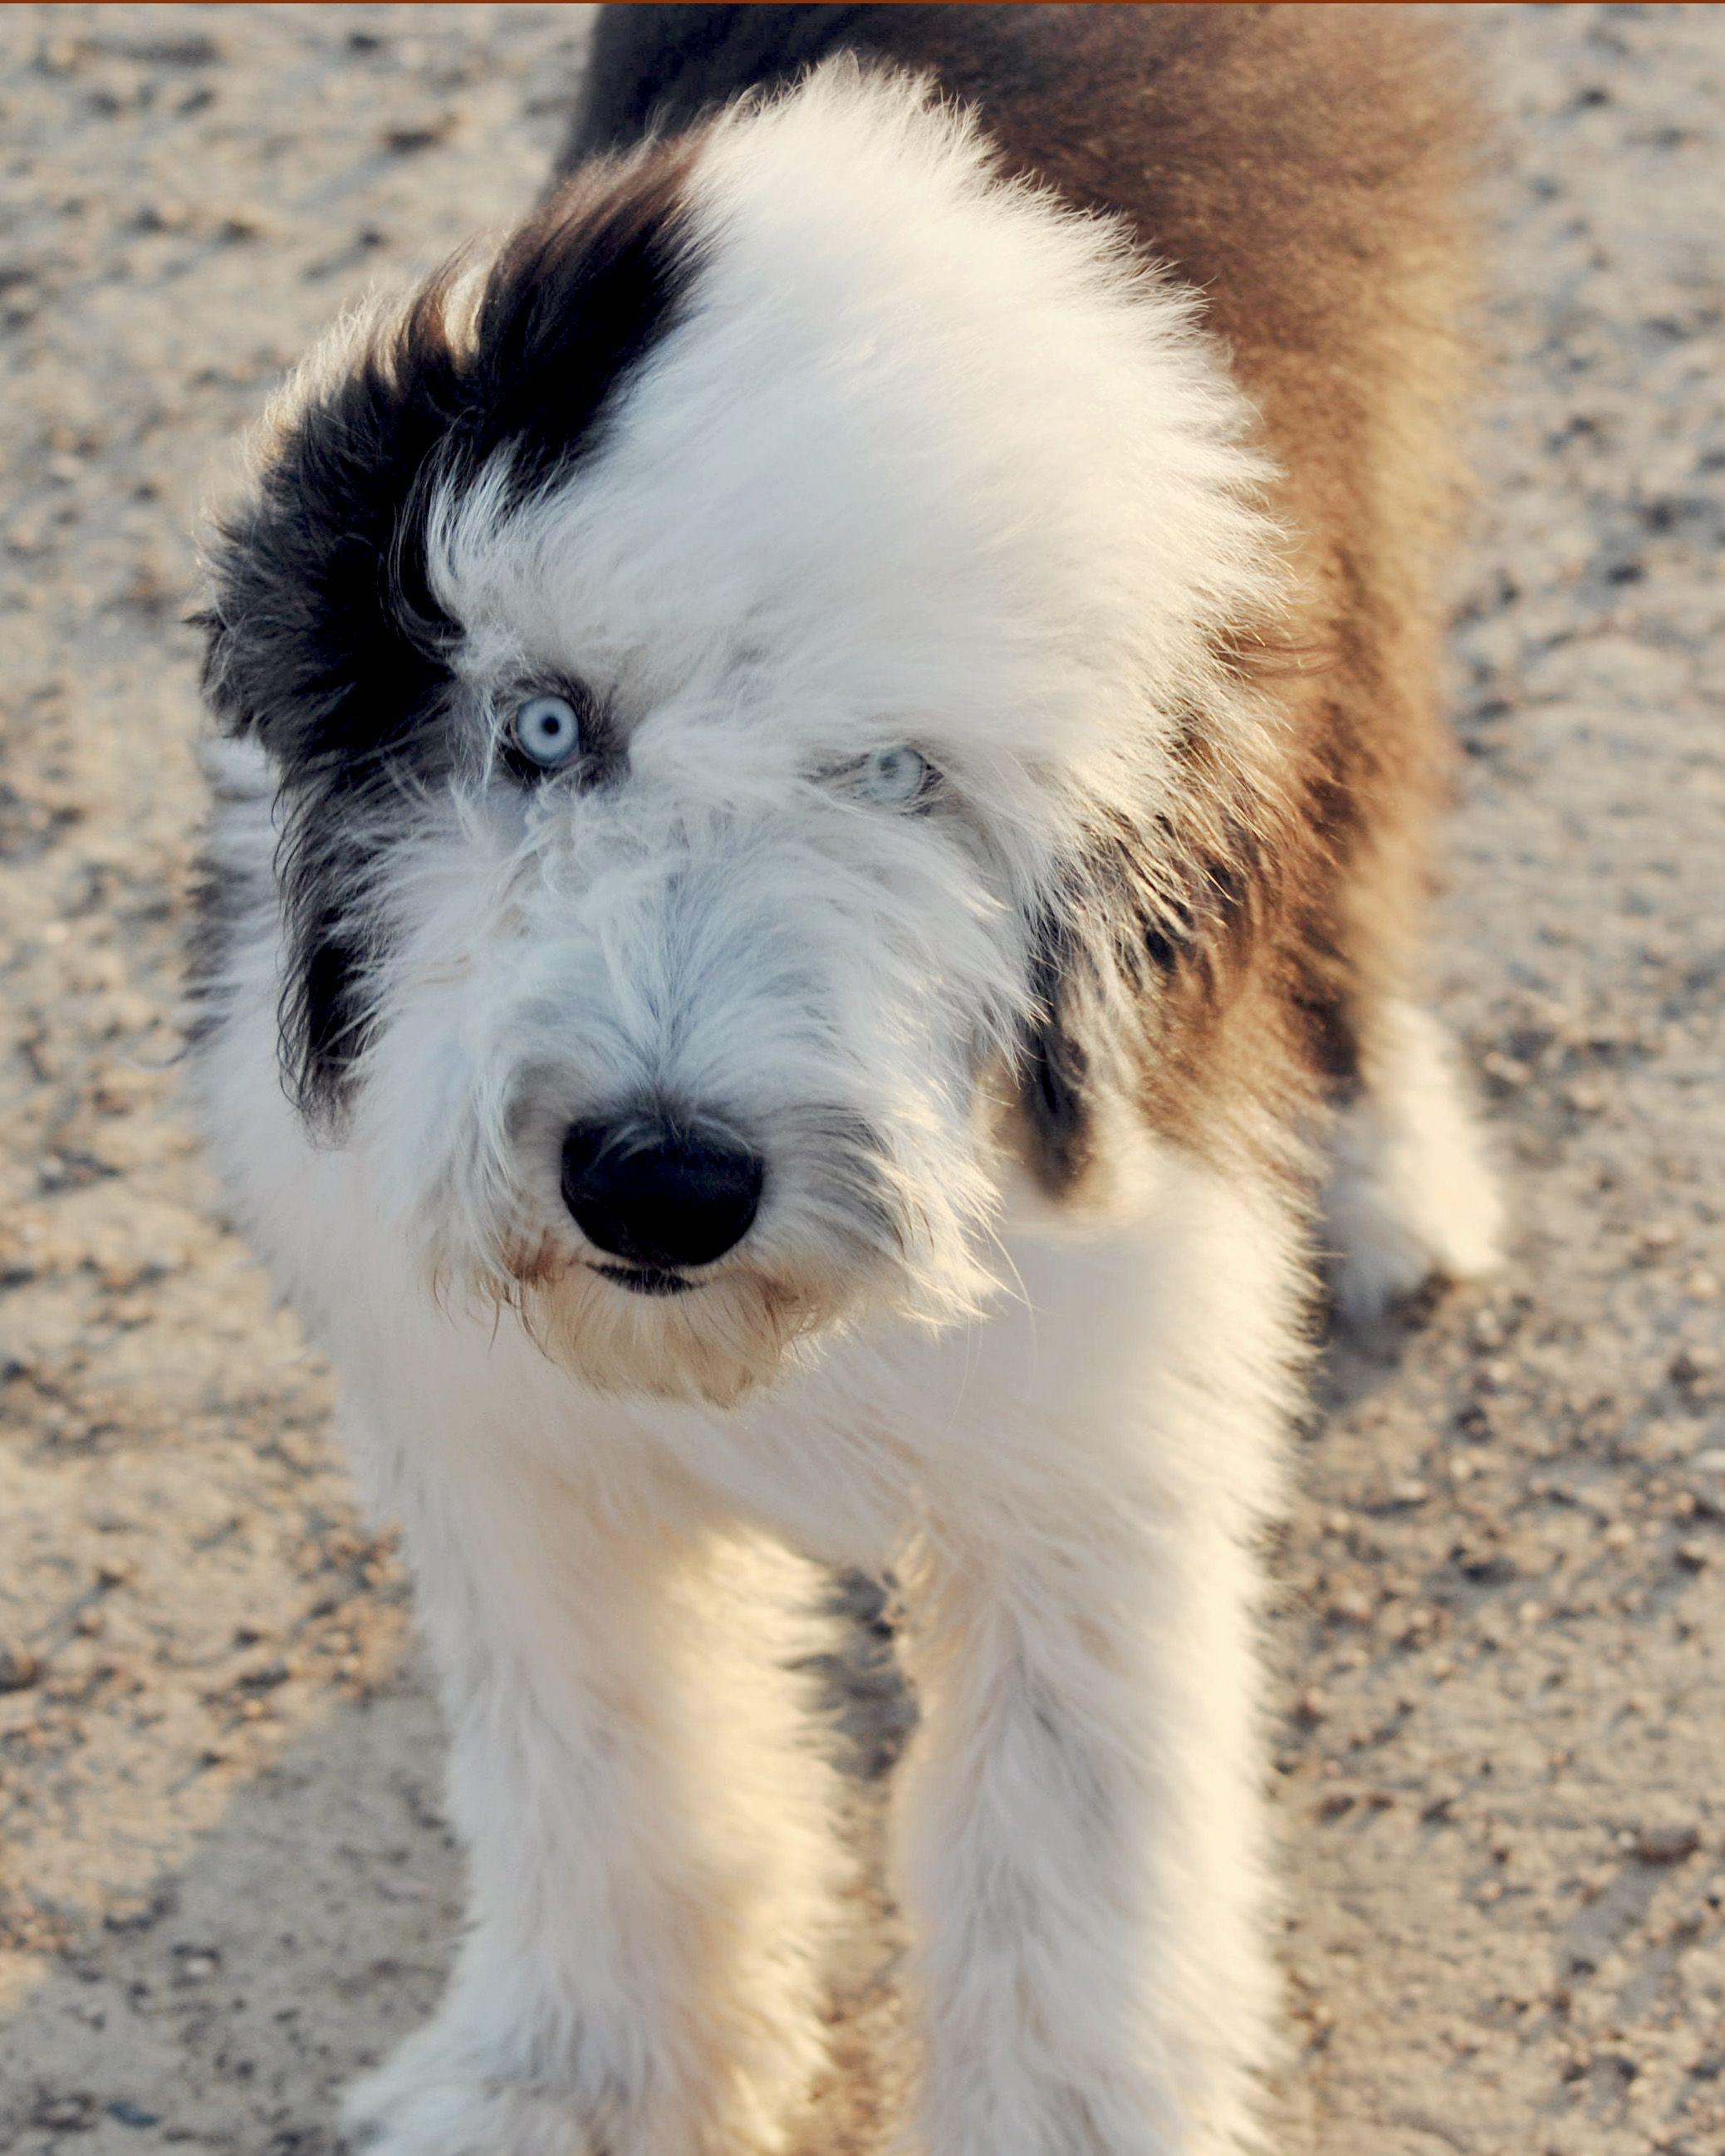 Crazy Eyed Chai Old English Sheepdog Old English Sheepdog Puppy English Sheepdog Old English Sheepdog